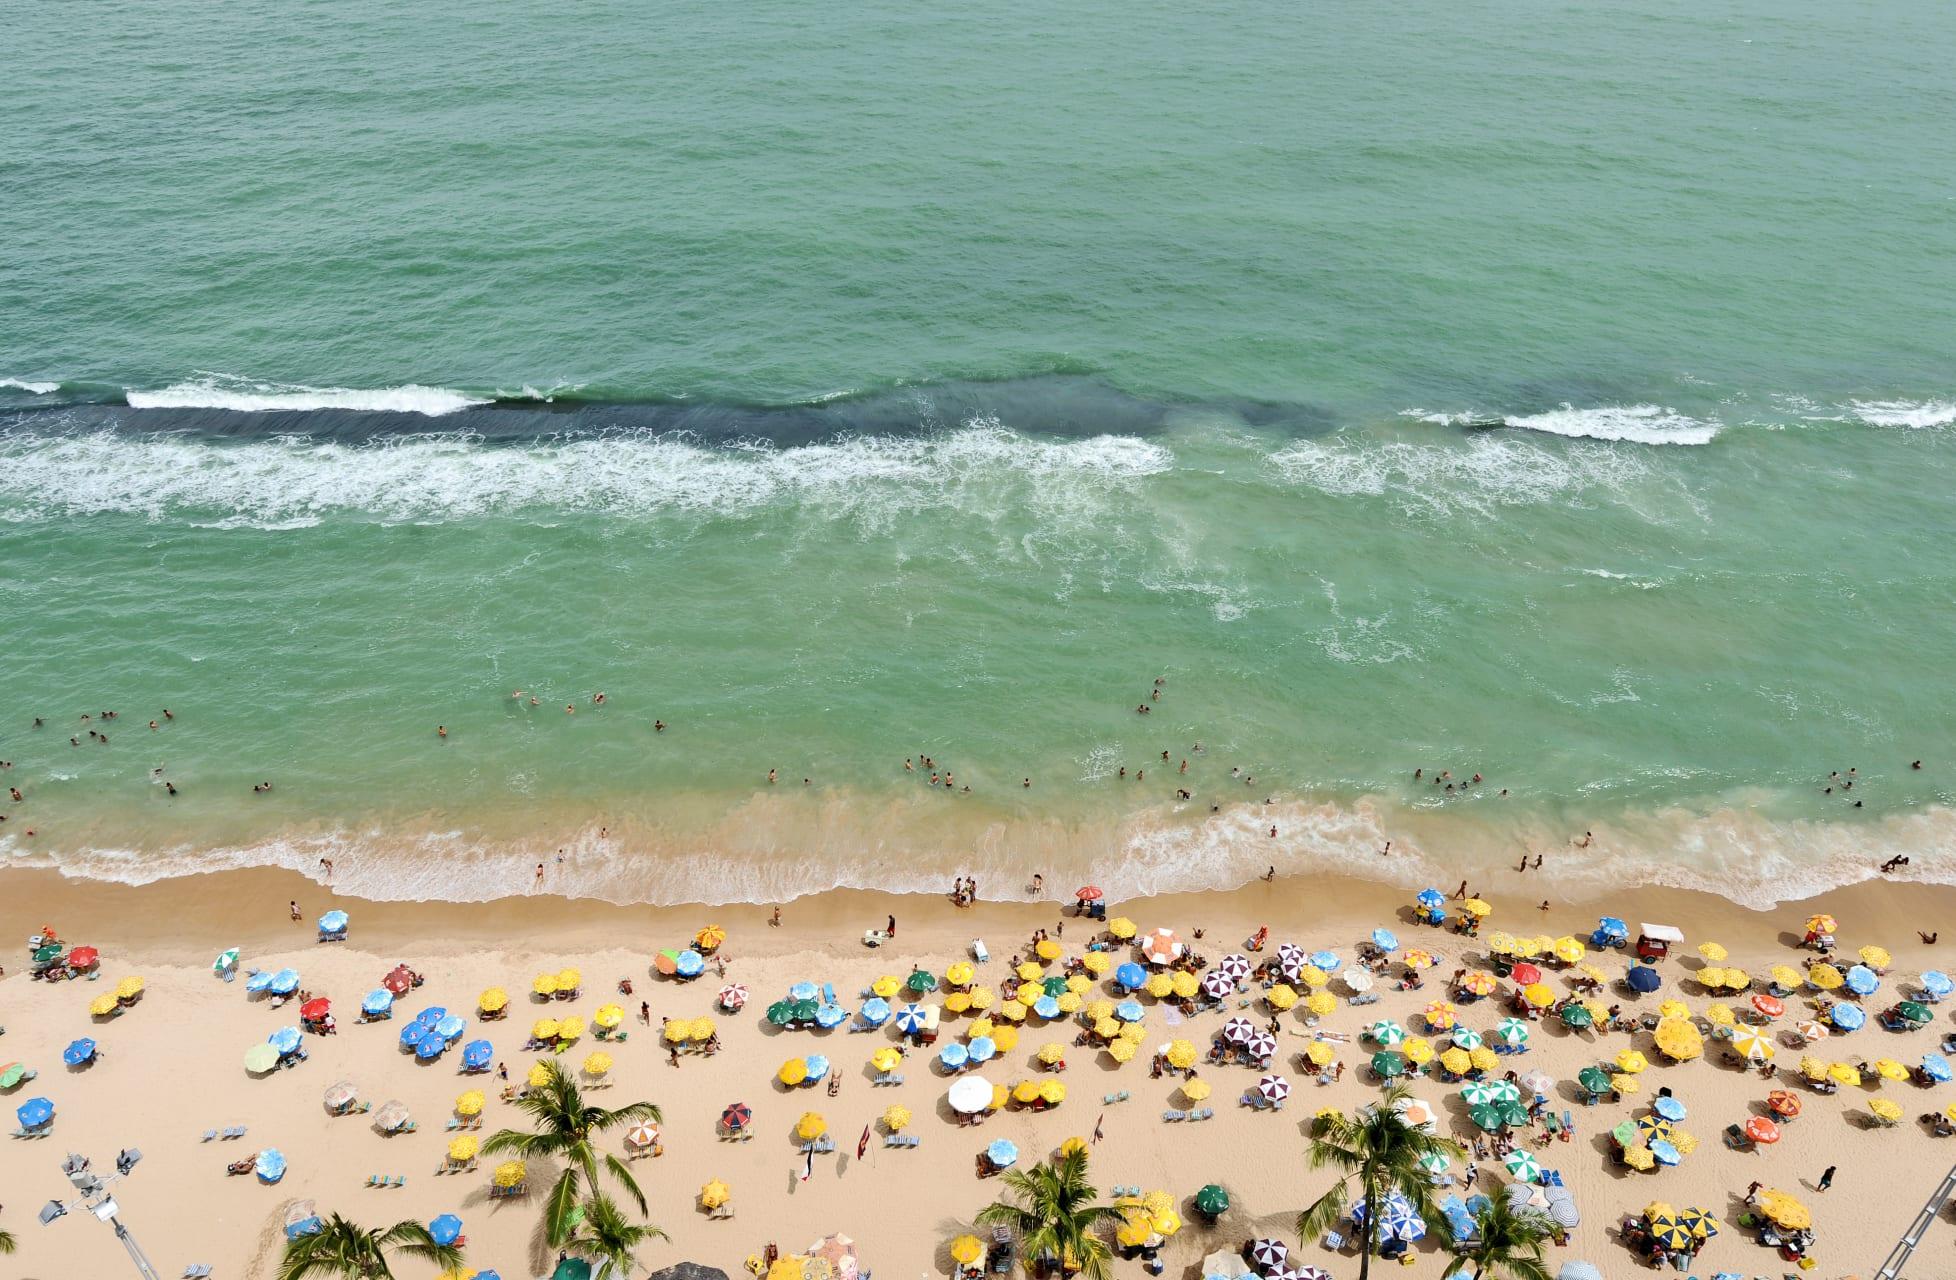 Recife - Boa Viagem: Recife's Most Beautiful Beach